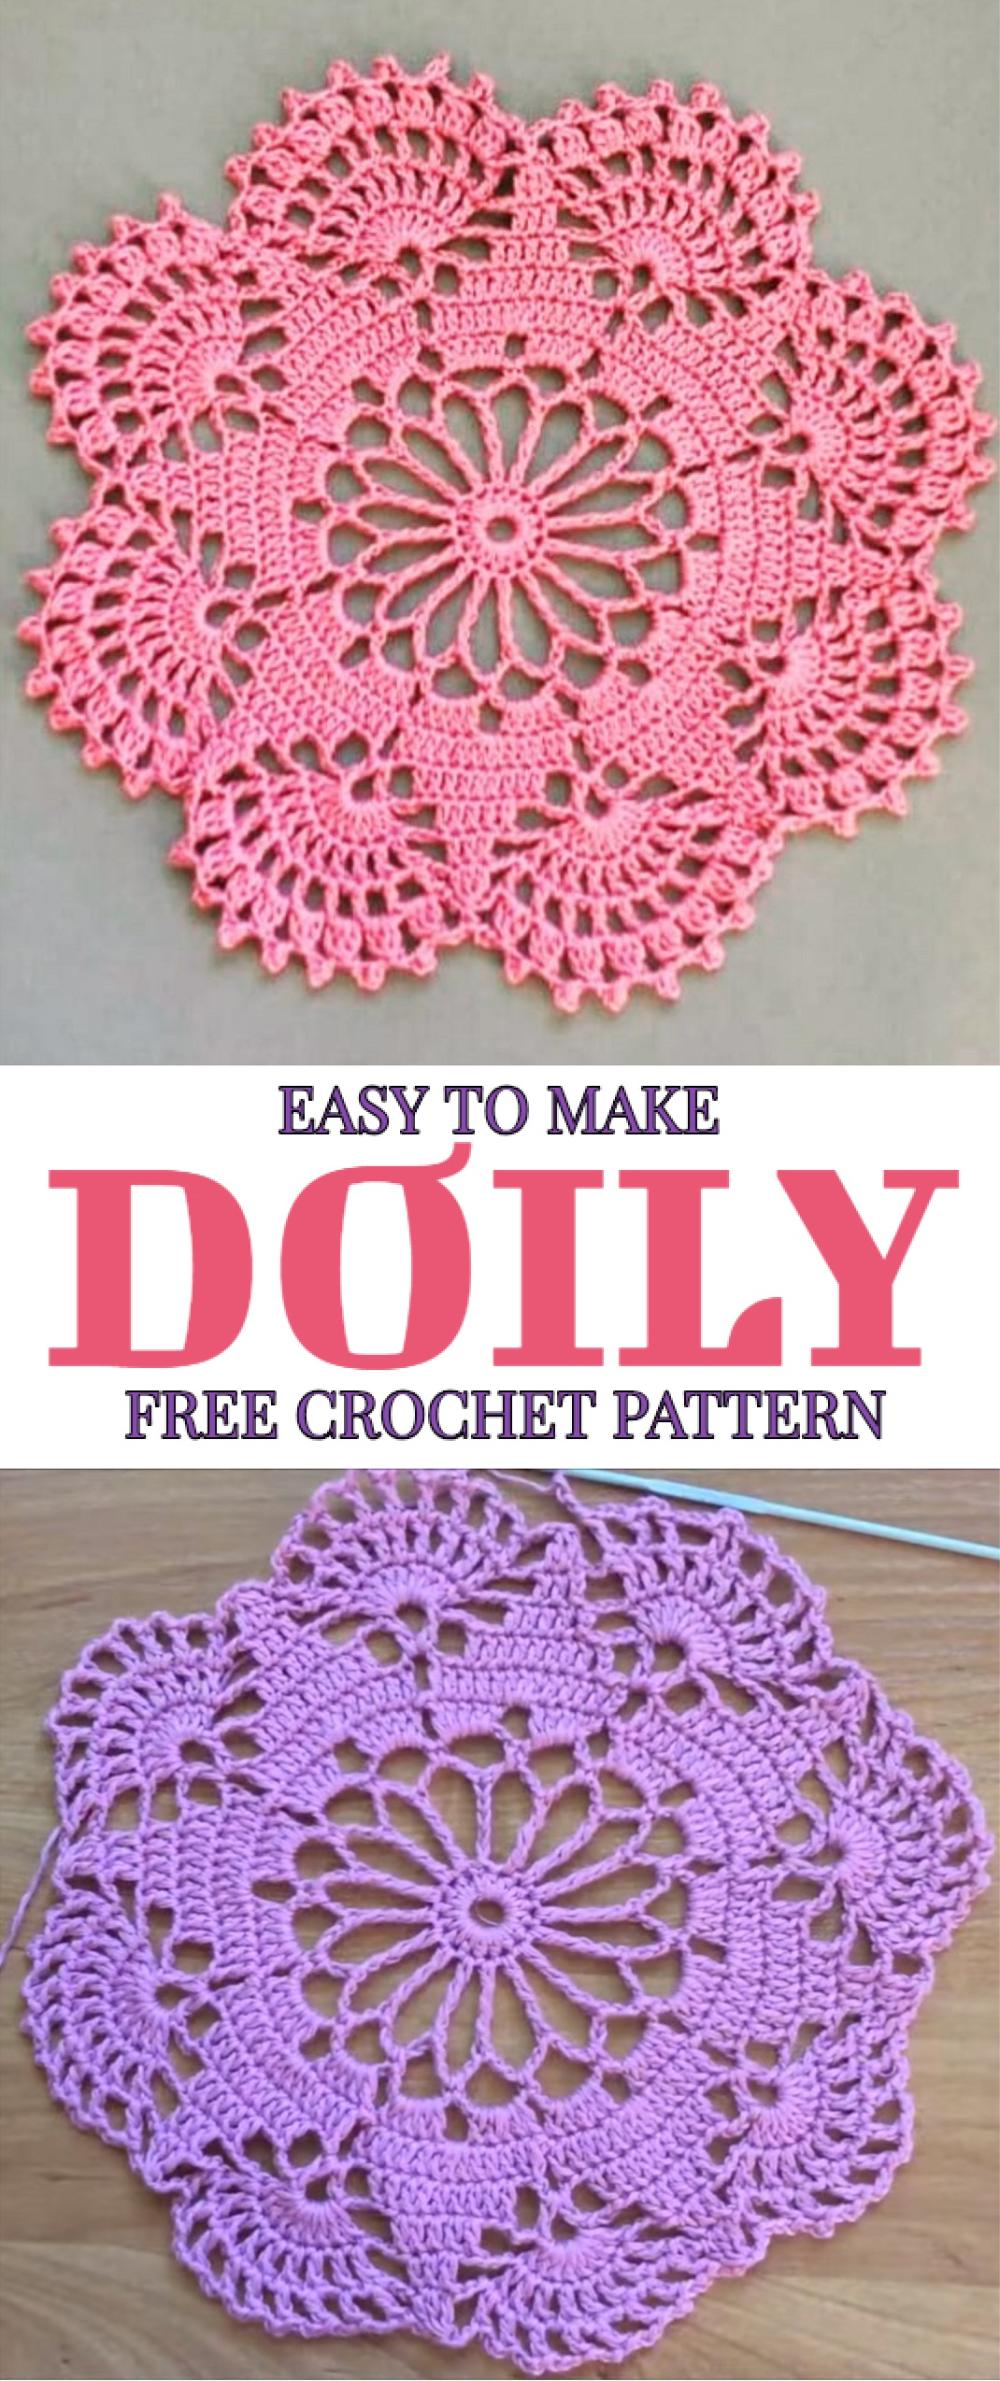 Easy To Make Doily Free Crochet Pattern #crochethooks